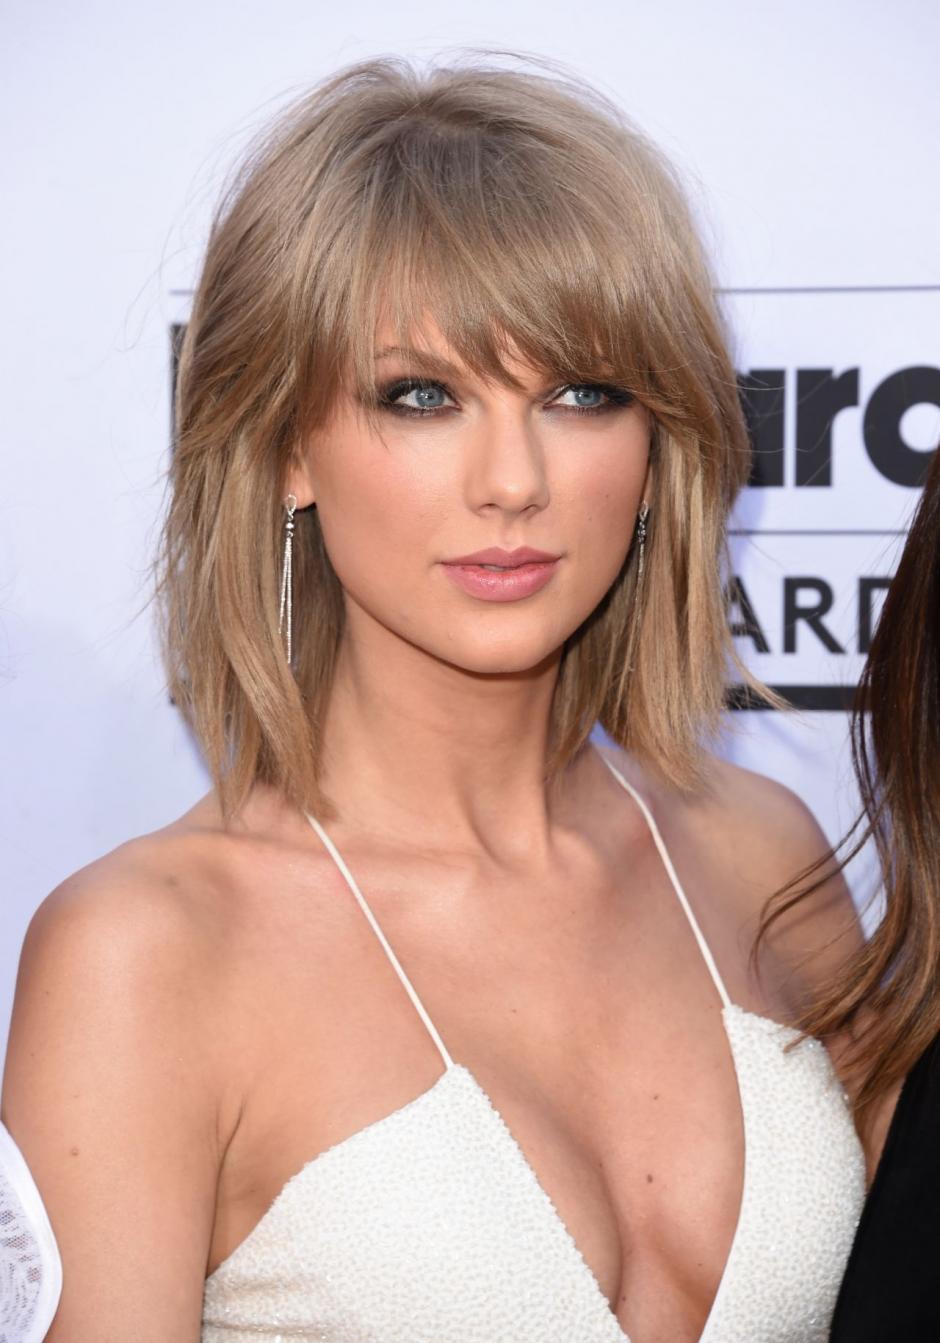 Taylor Swift es una cantautora estadounidense. (Foto: celebmafia.com)